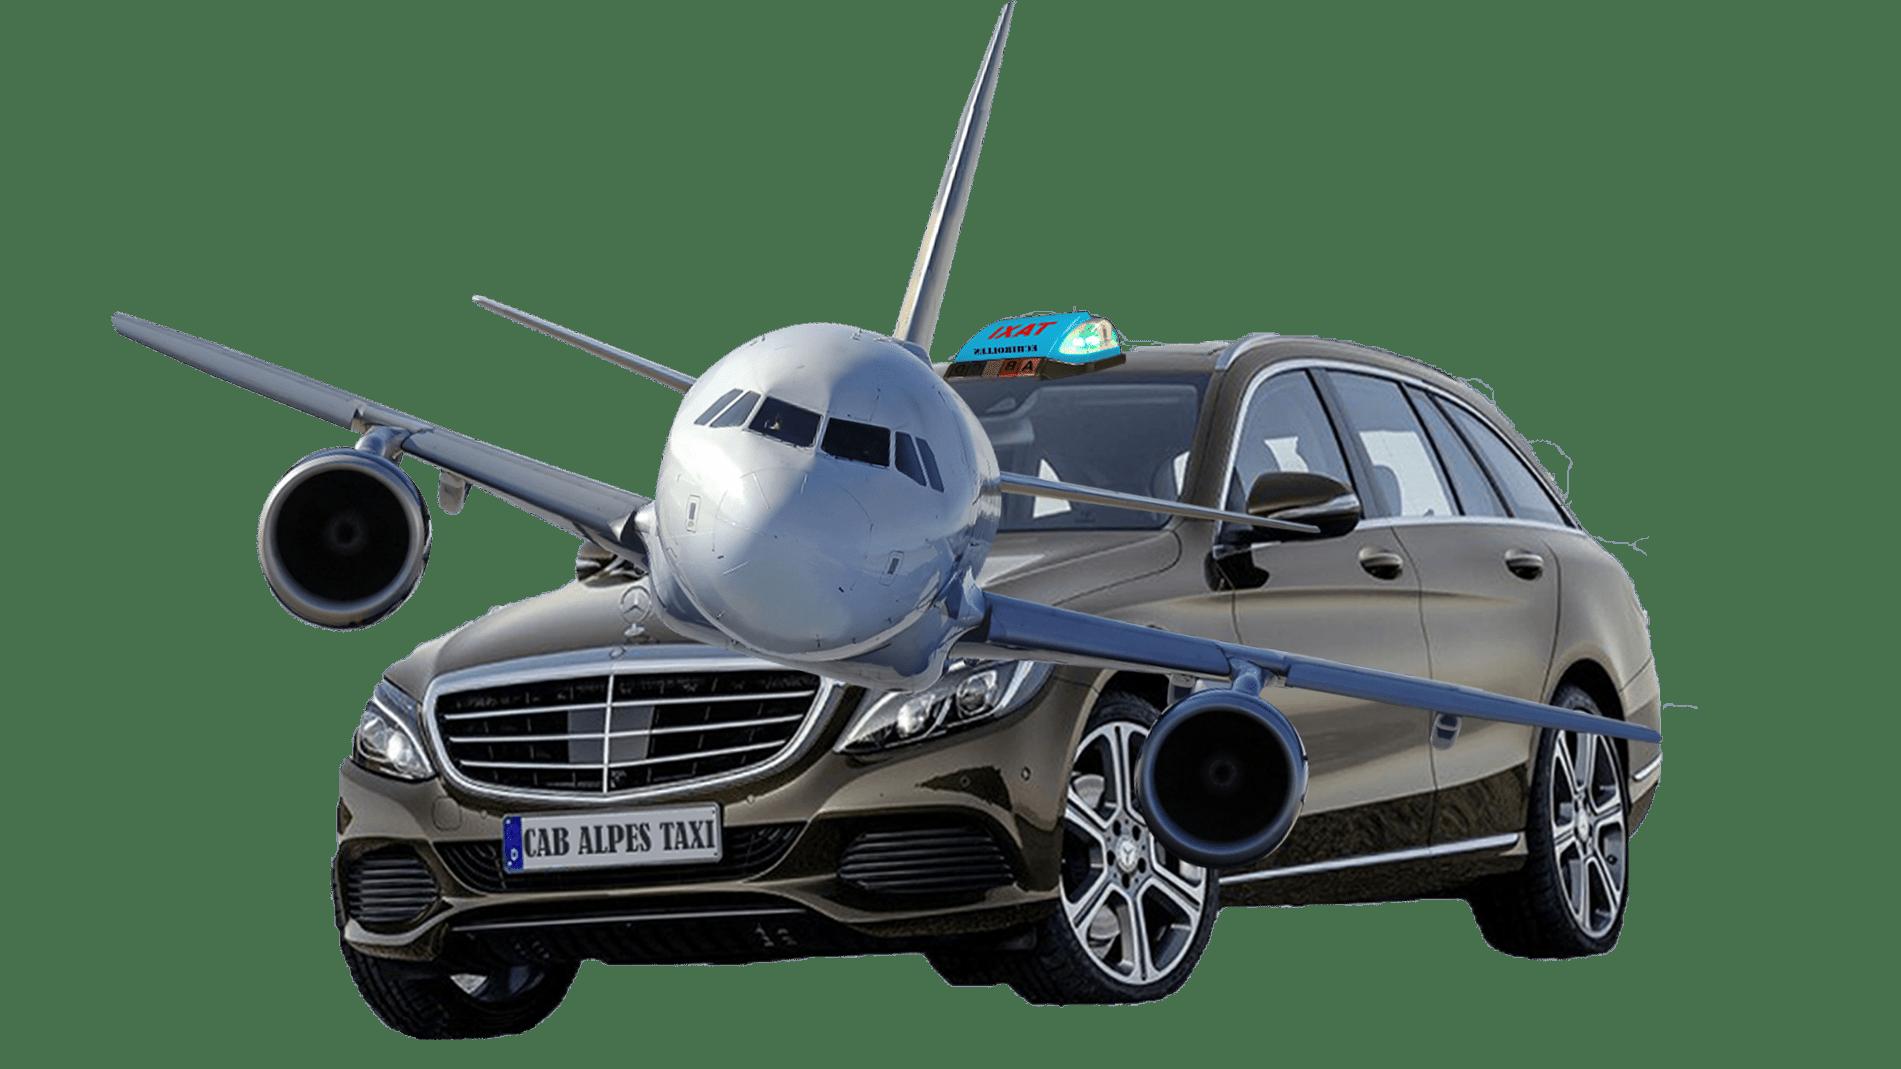 Taxi aéroport